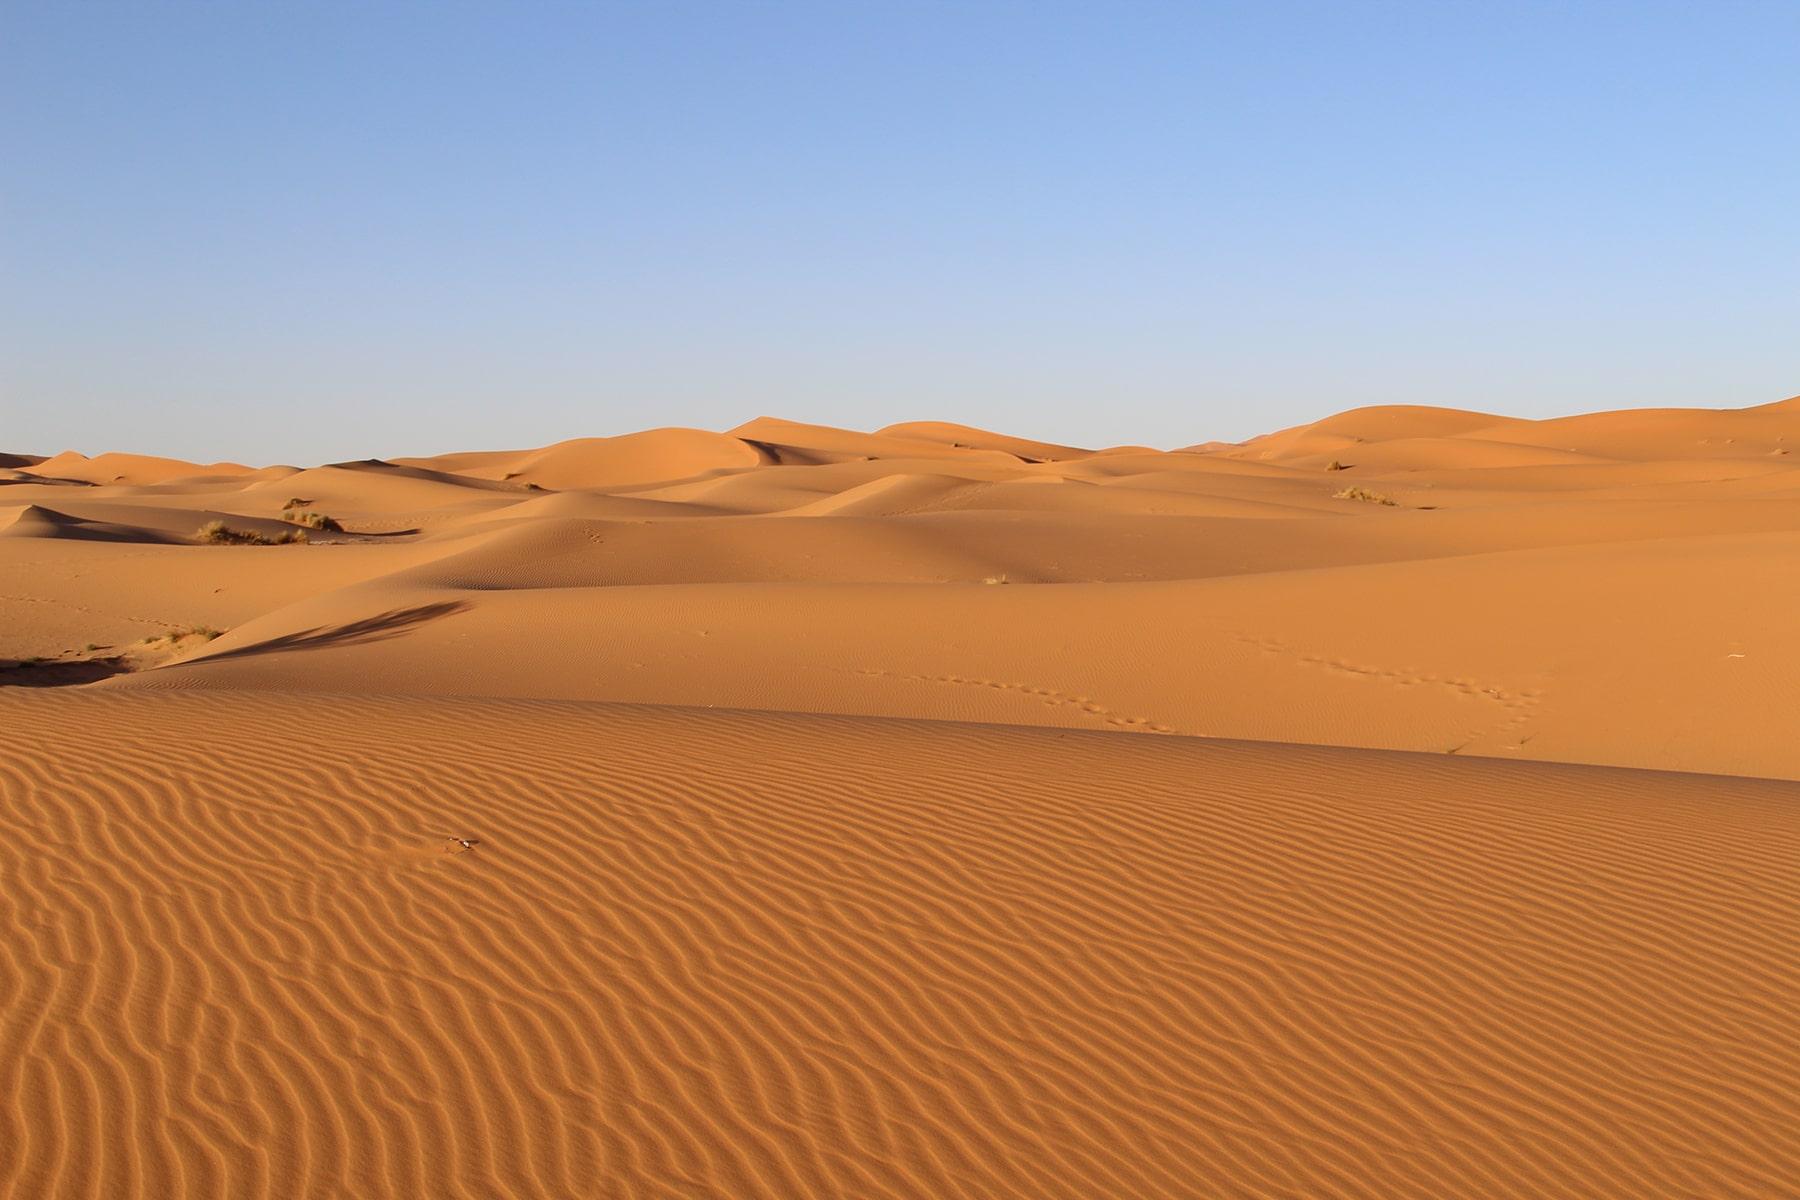 Dune a Merzouga (deserto del Sahara)